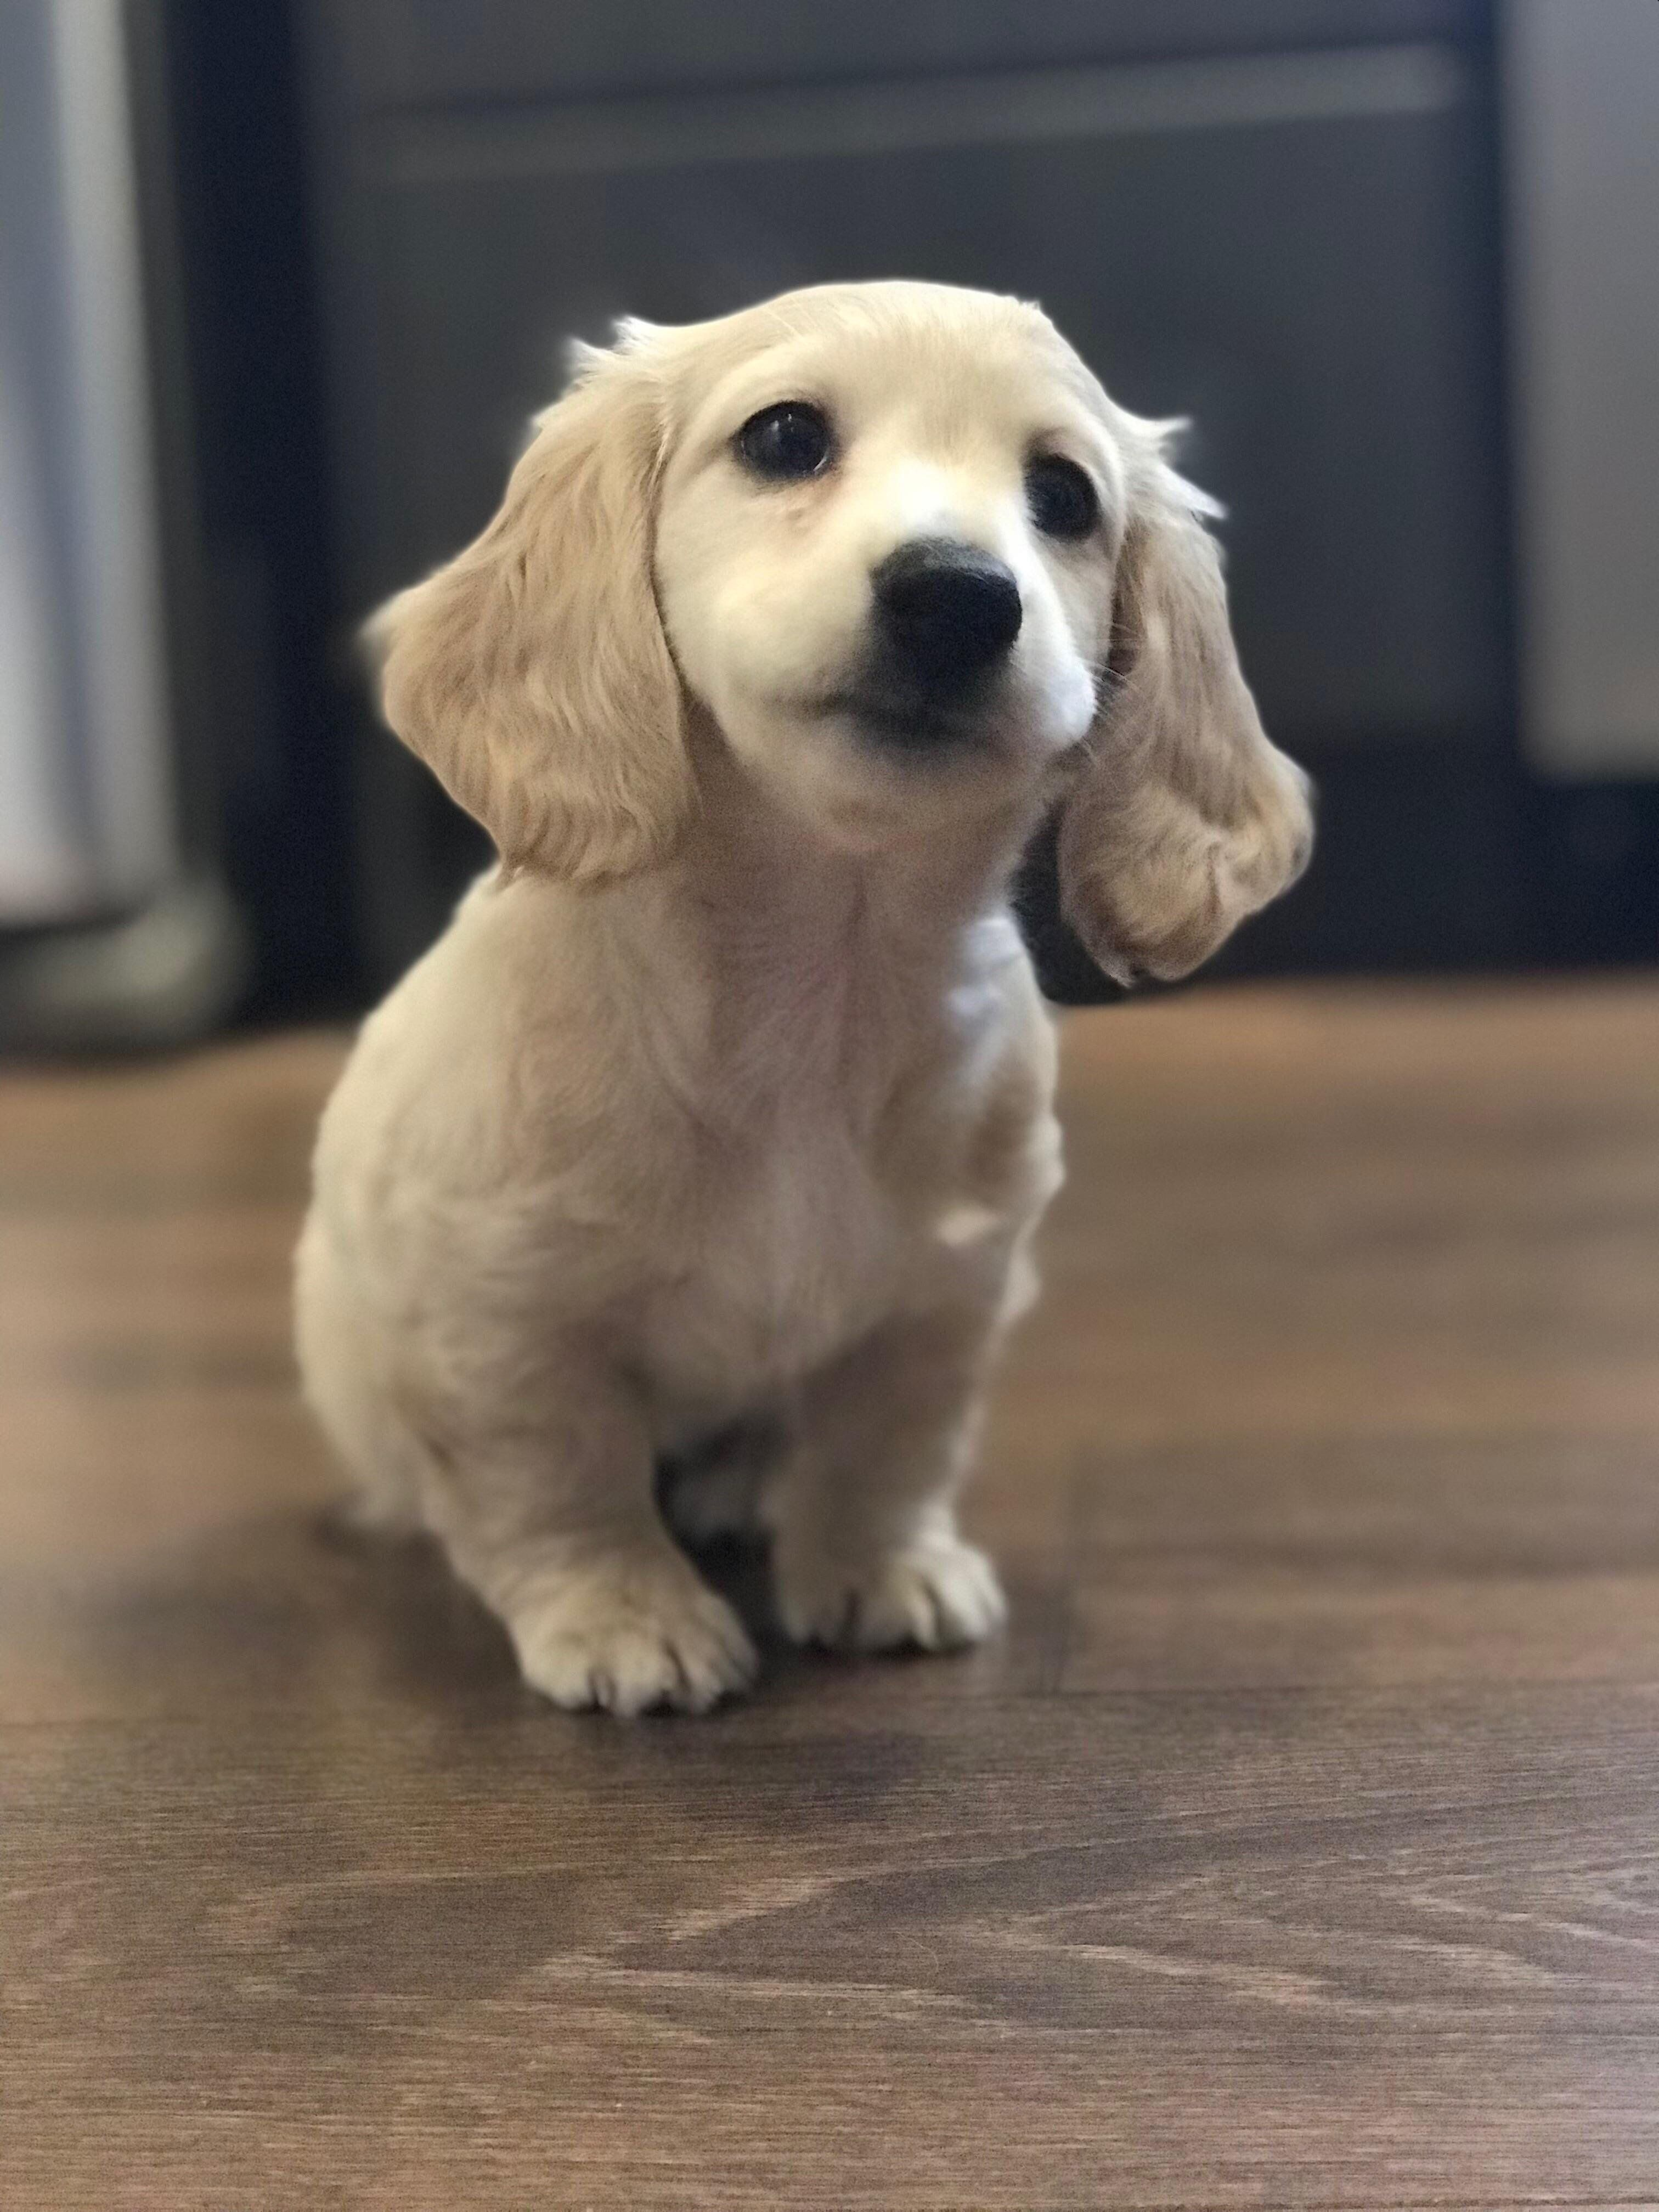 English Cream Dachshund Puppy Eyebleach Puppy Dog Pictures Cute Baby Animals Cute Dogs